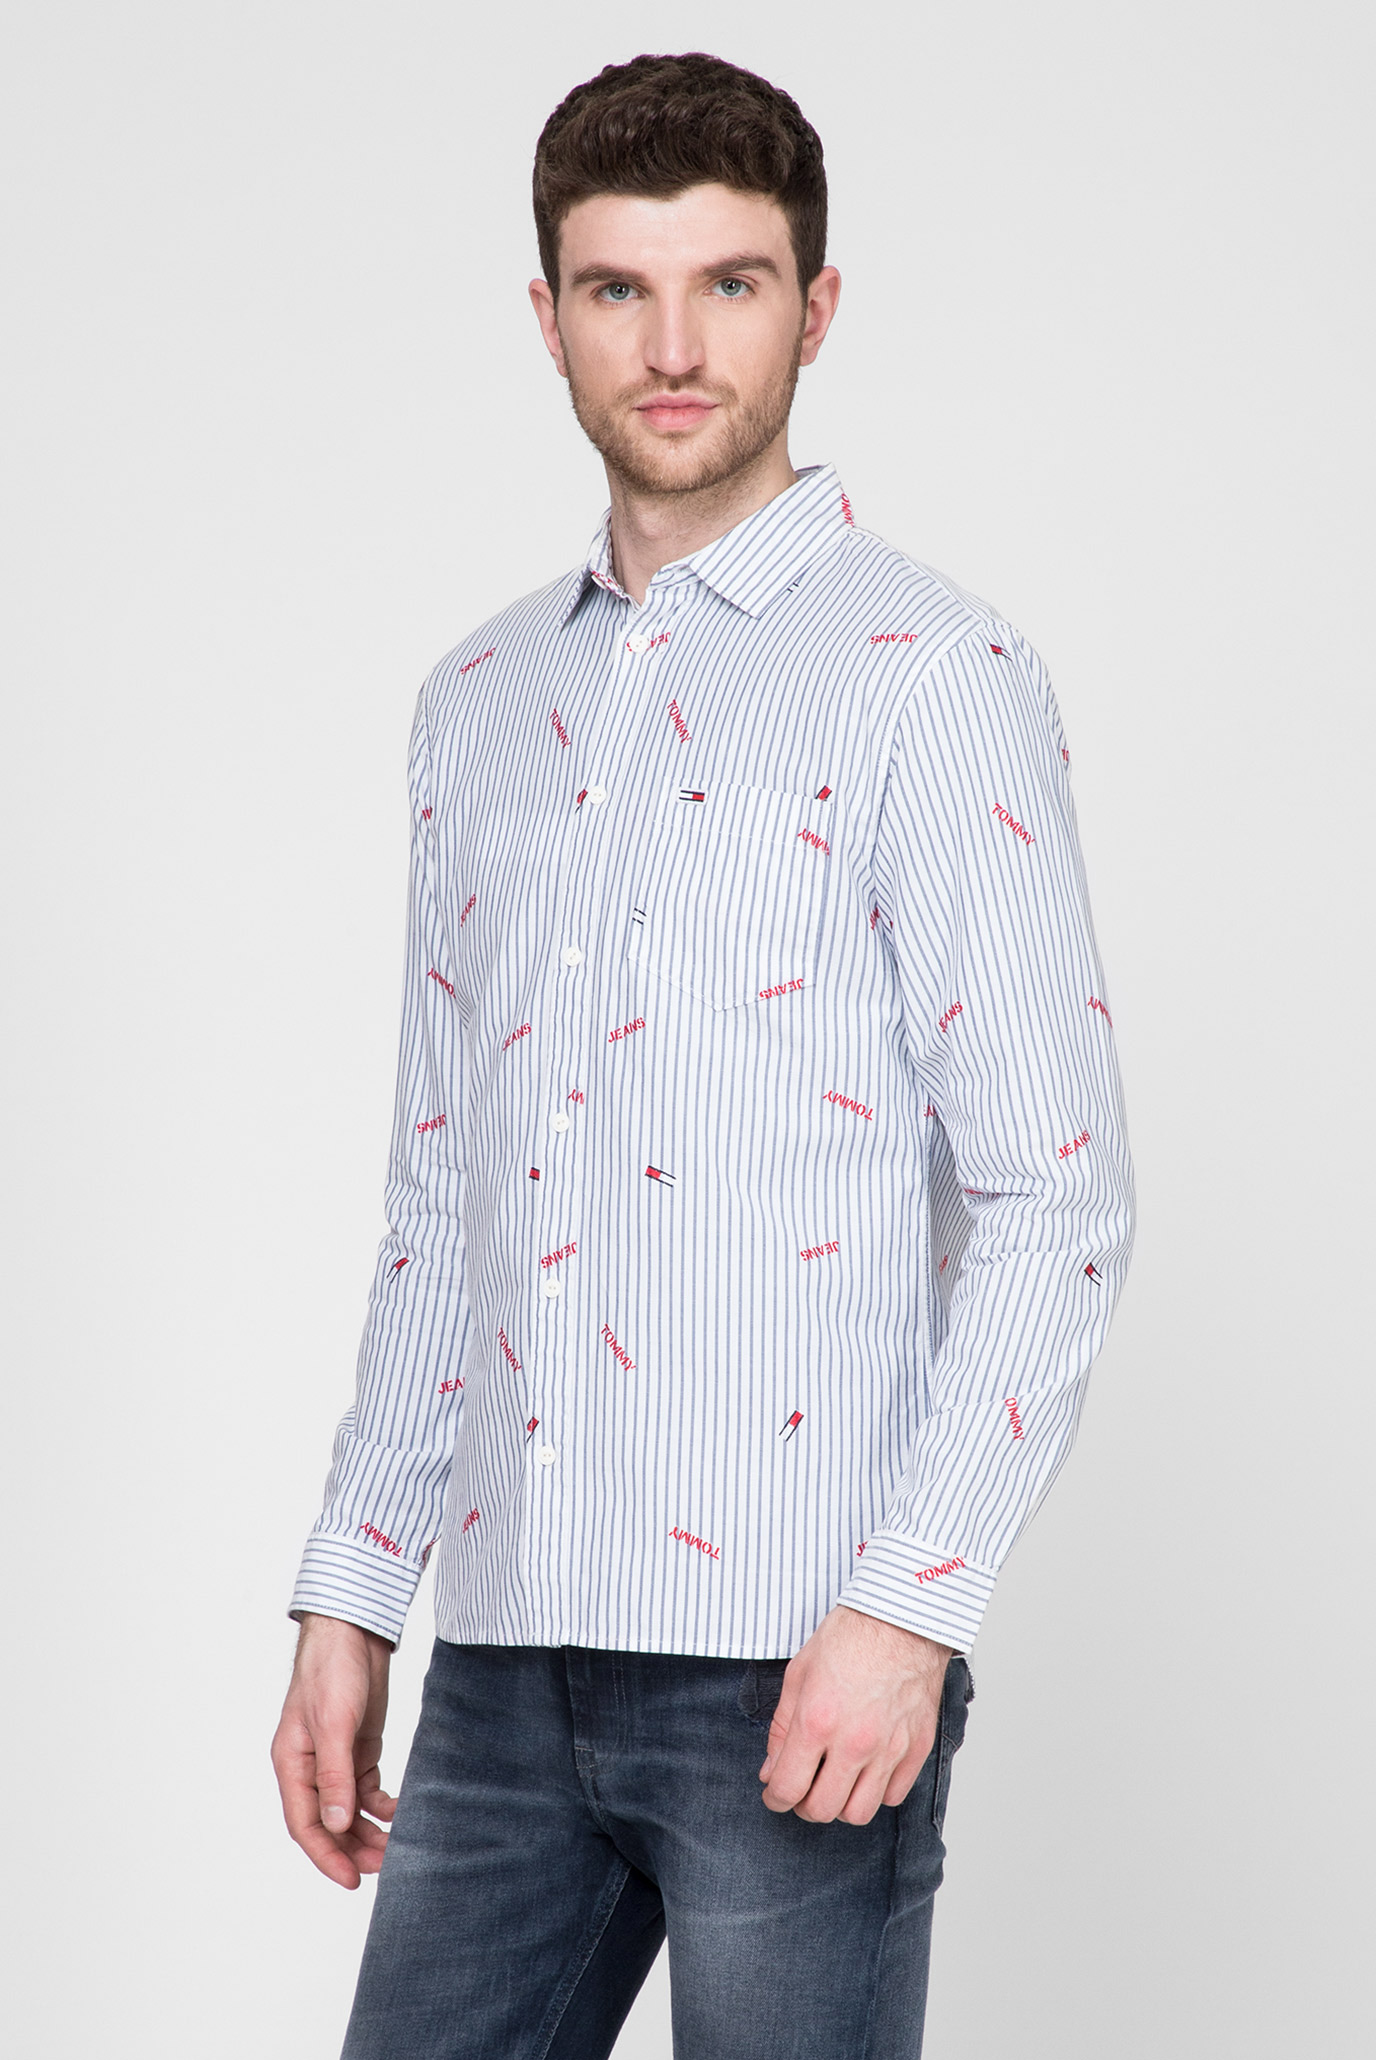 Мужская рубашка в полоску TJM BRANDED CHAMBRAY Tommy Hilfiger